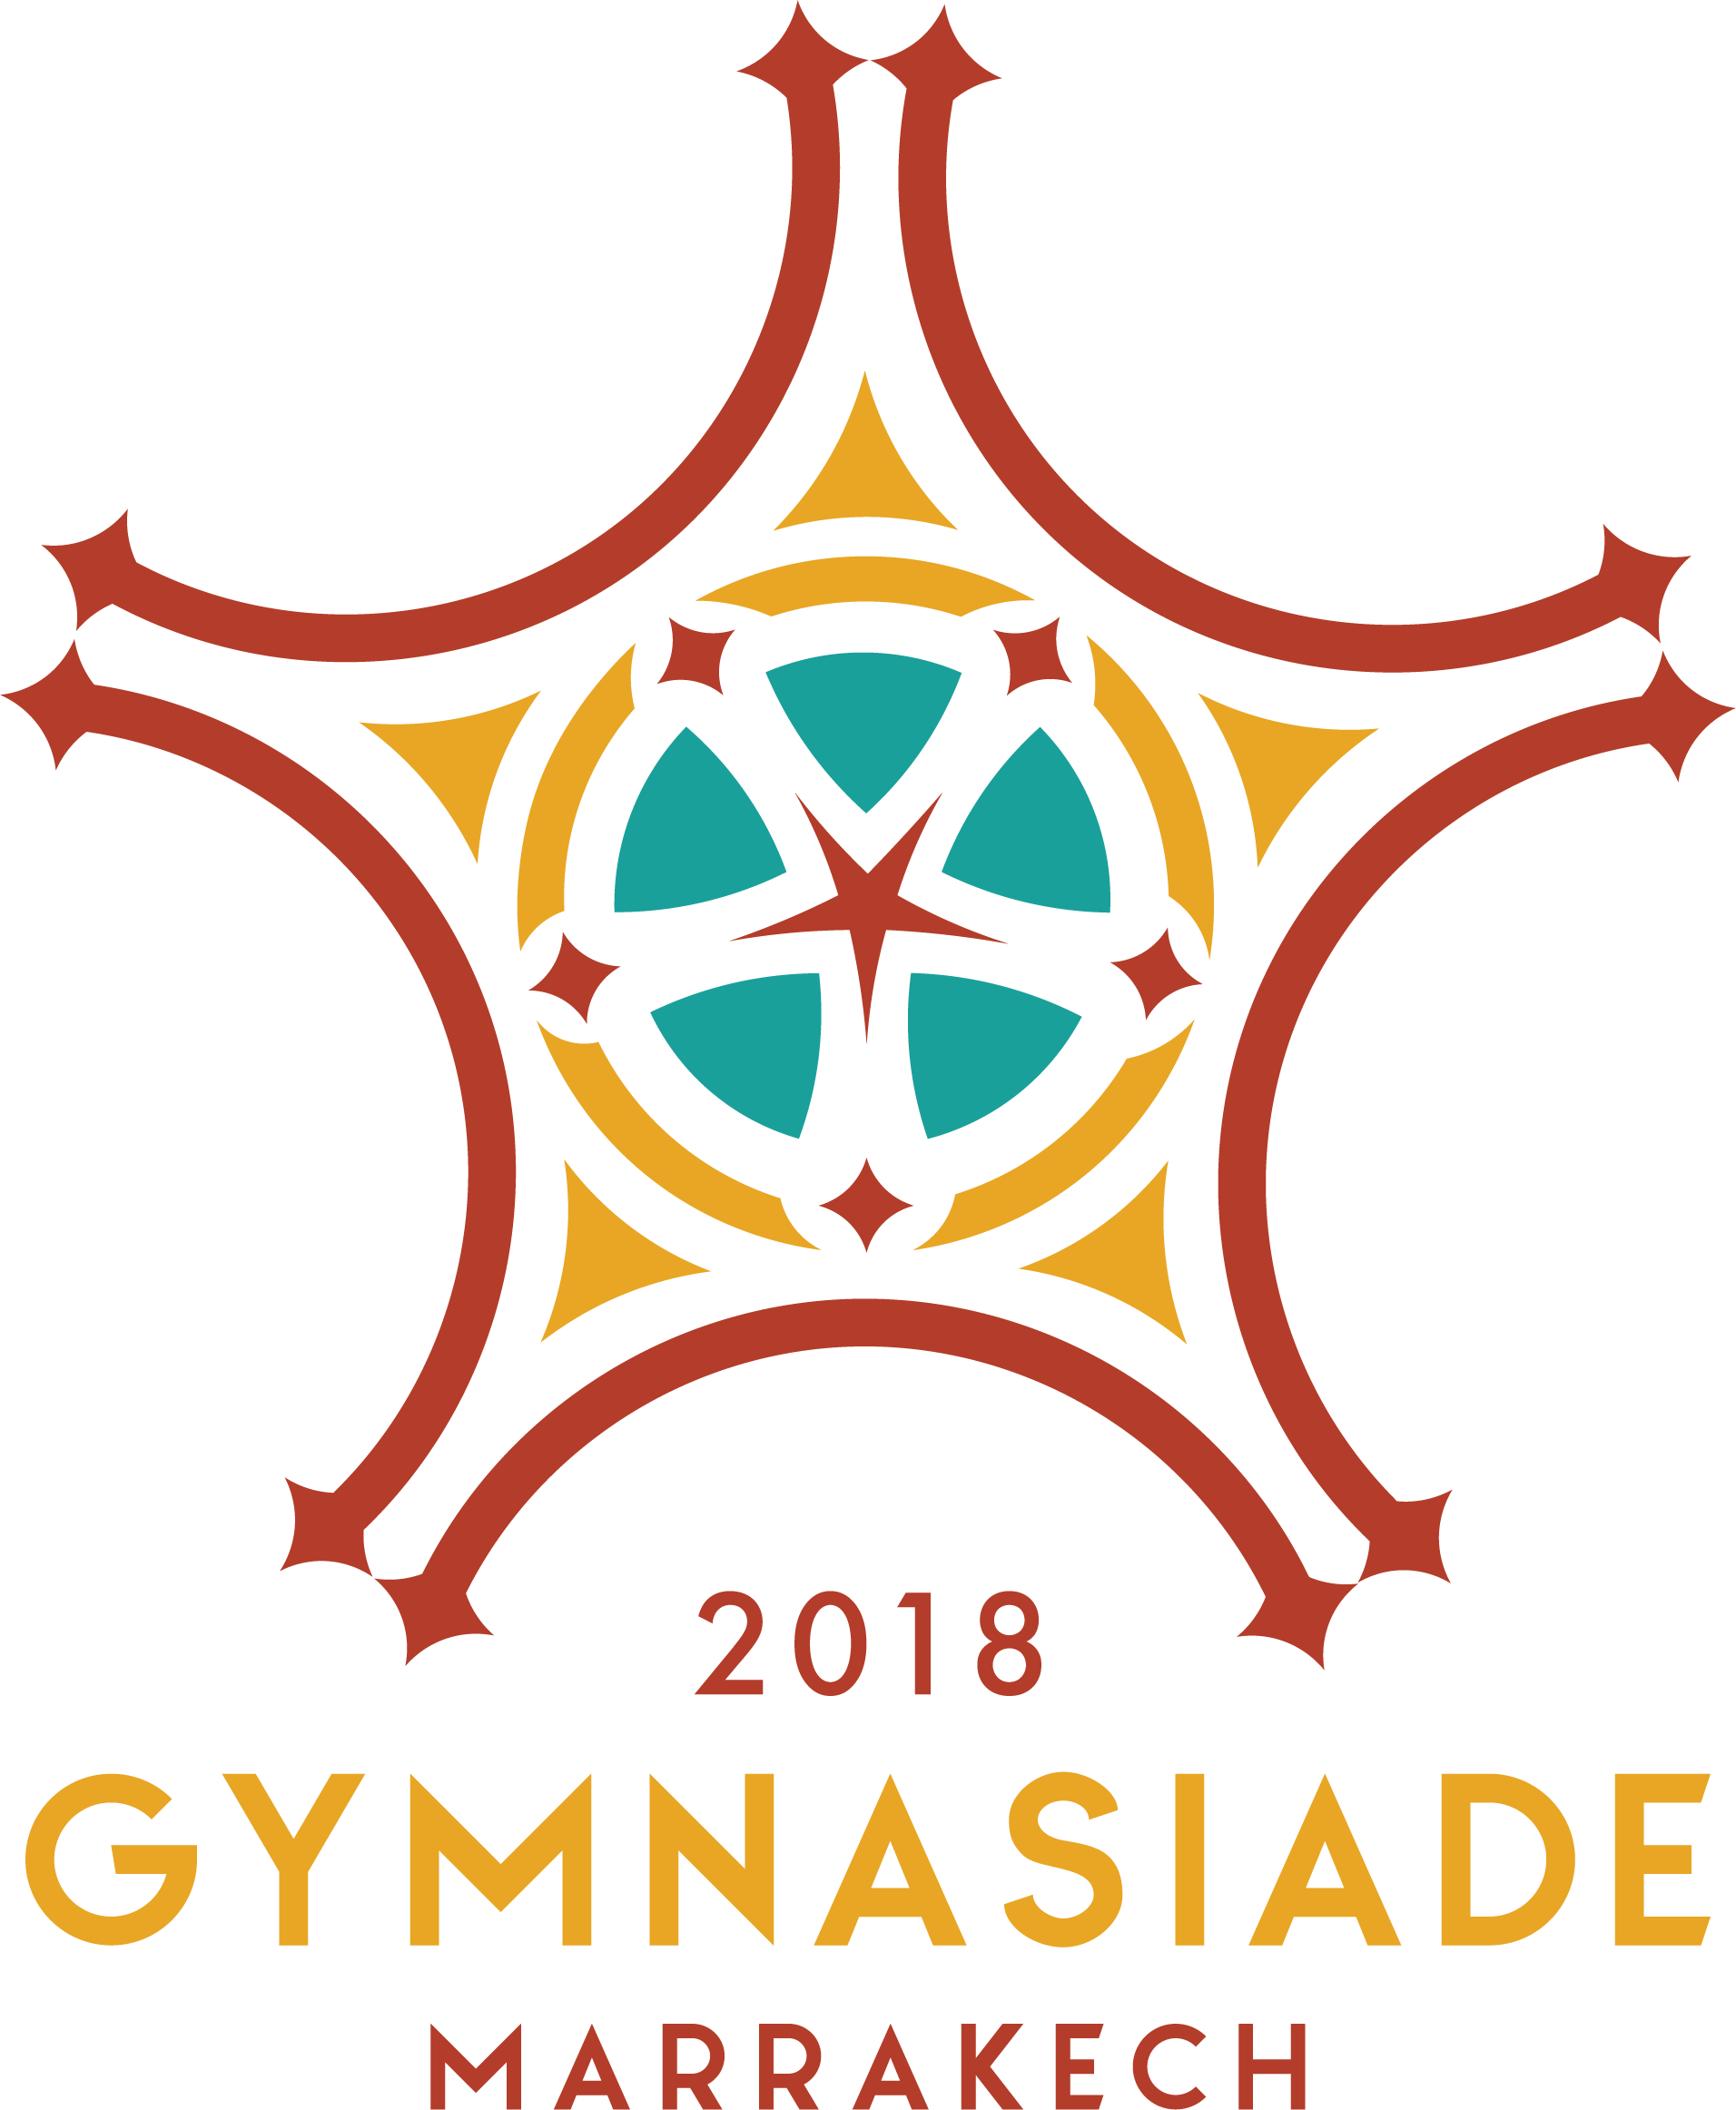 Gymnasiade logo.png